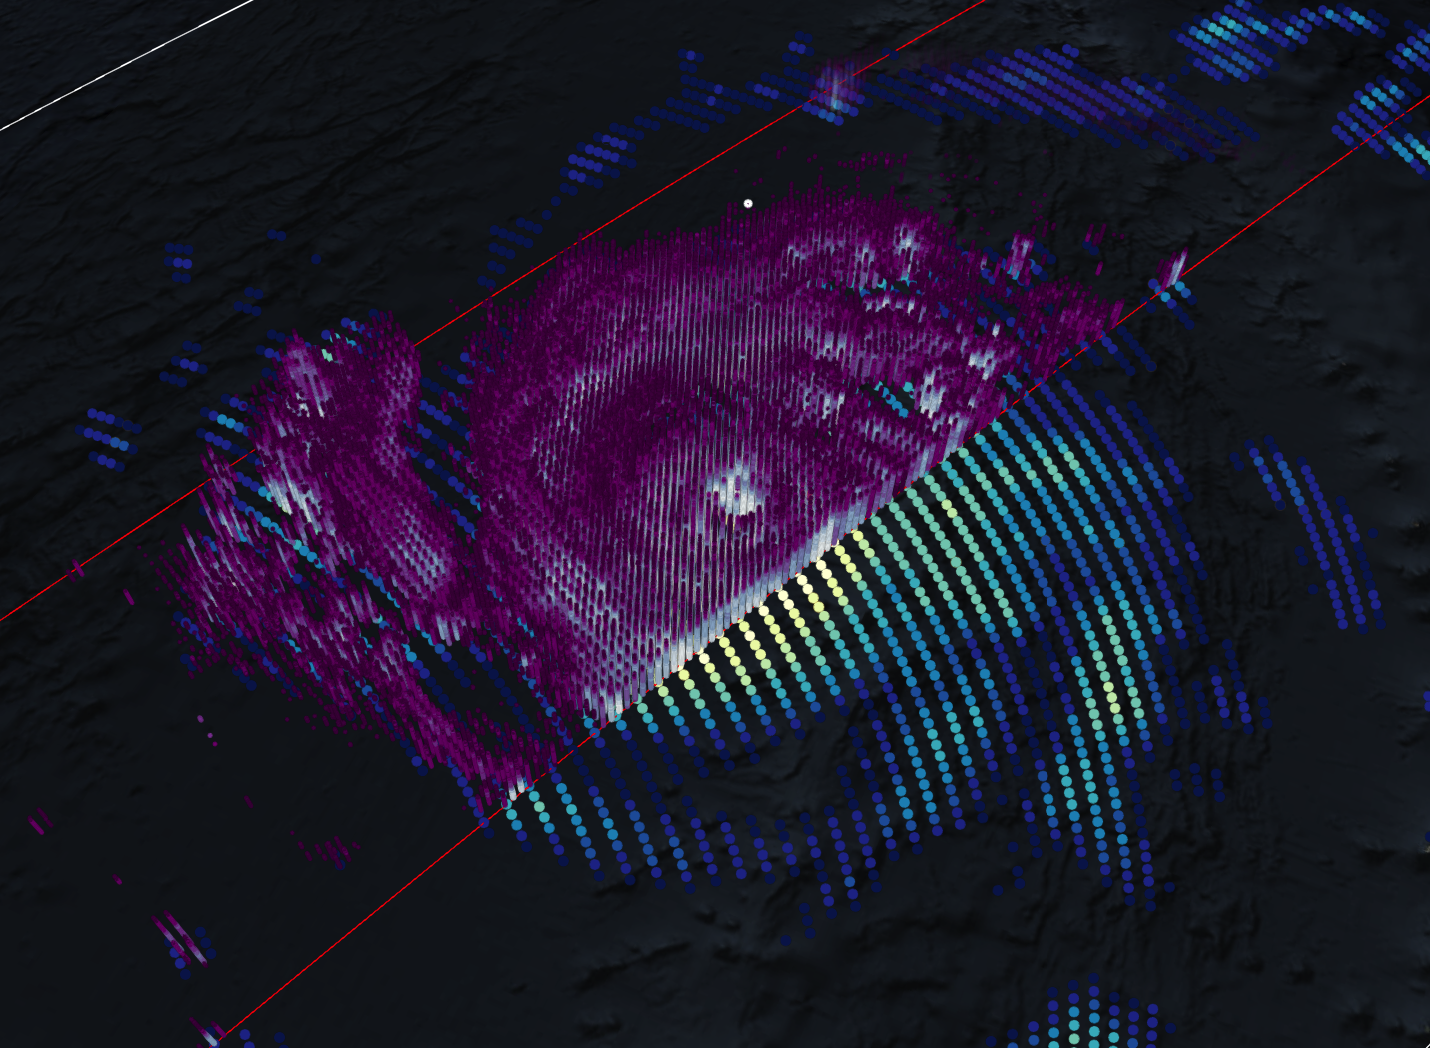 GPM Views Super Typhoon Jebi Twice